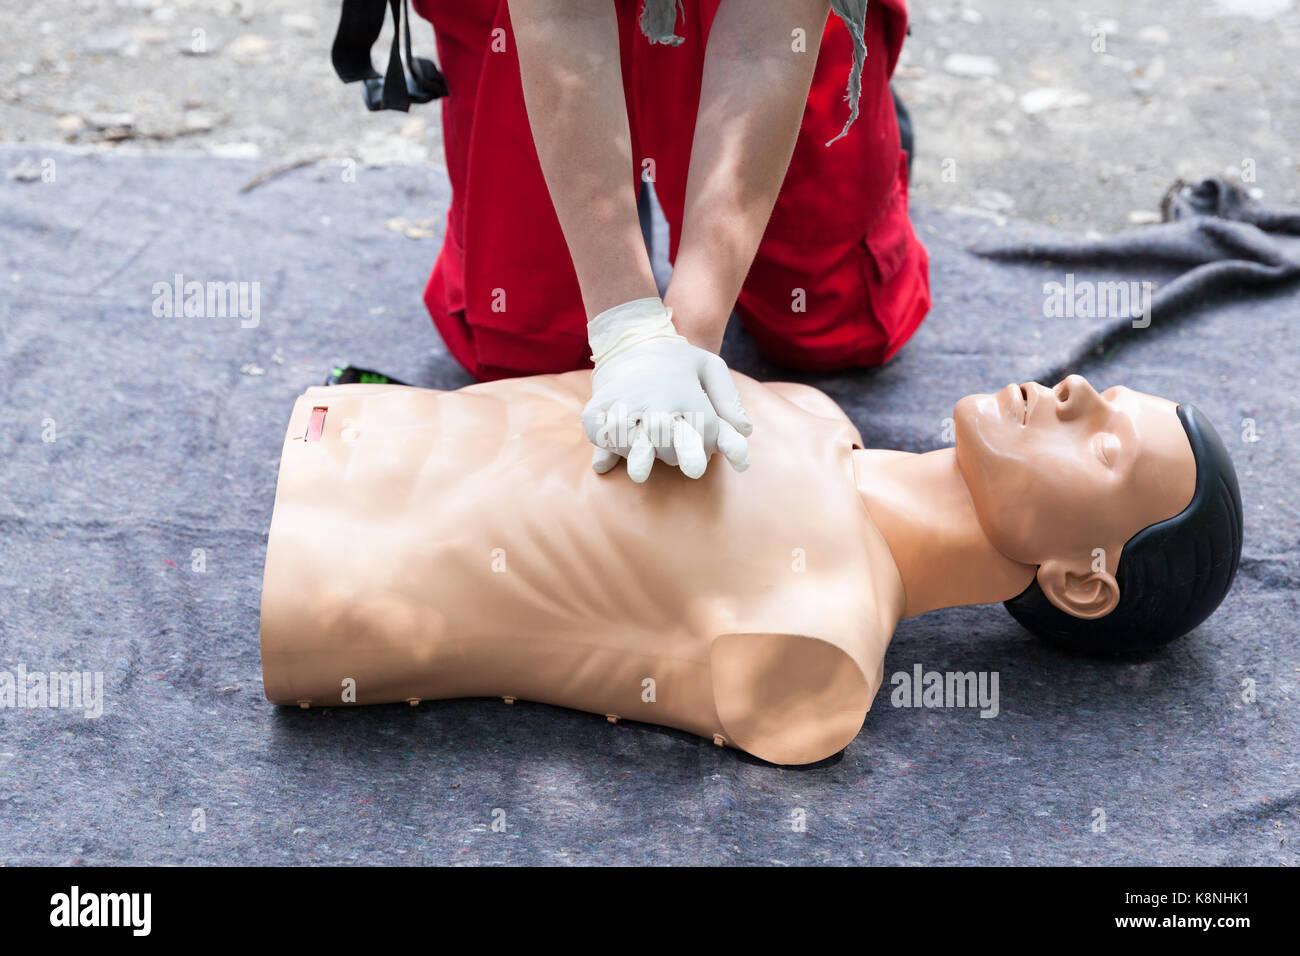 f6ef1bcf37 First aid training. Cardiopulmonary resuscitation - CPR Stock Photo ...